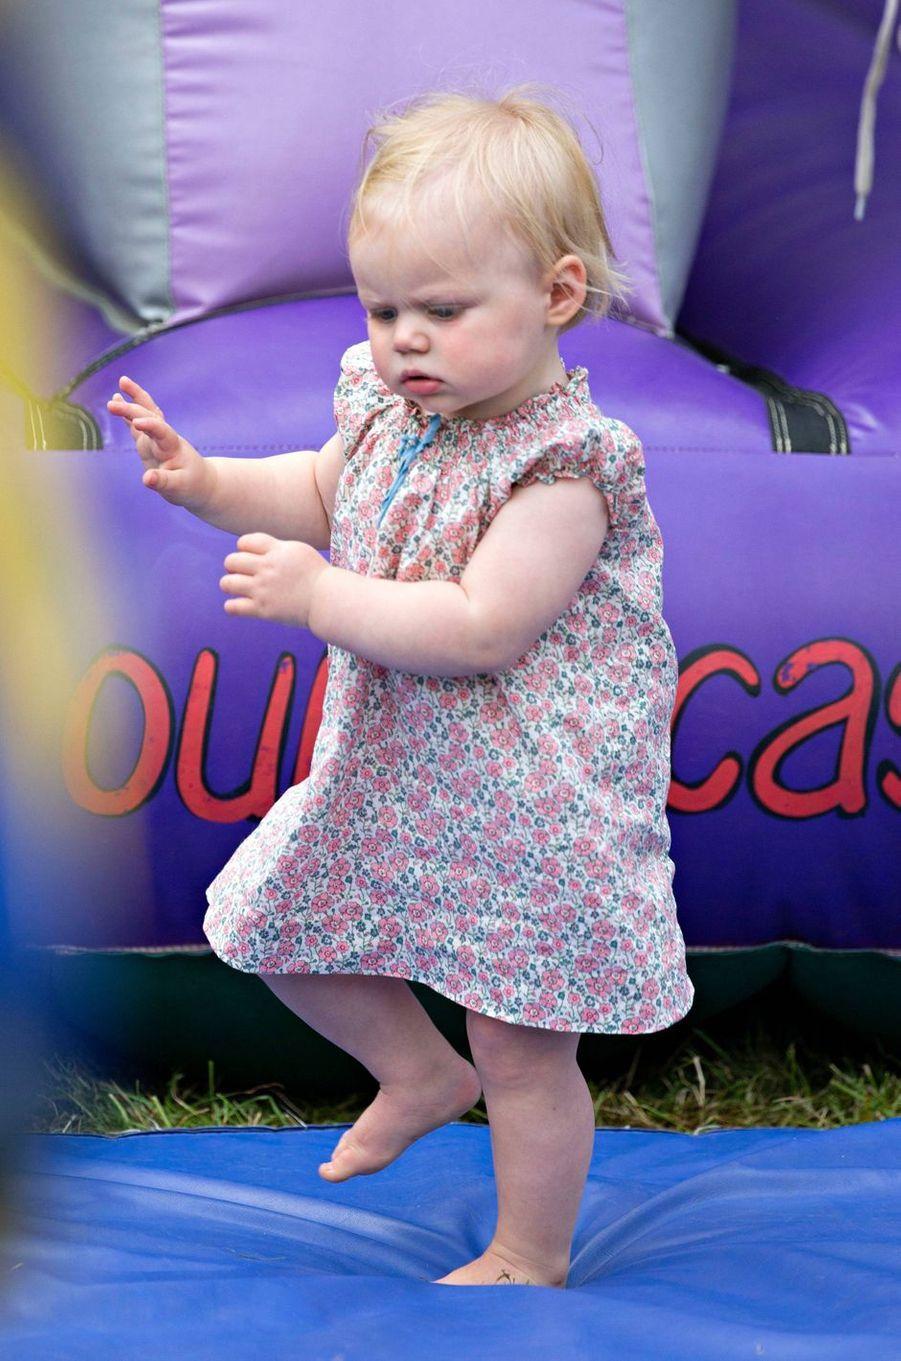 La petite Lena Tindall à Gatcombe Park, le 2 août 2019